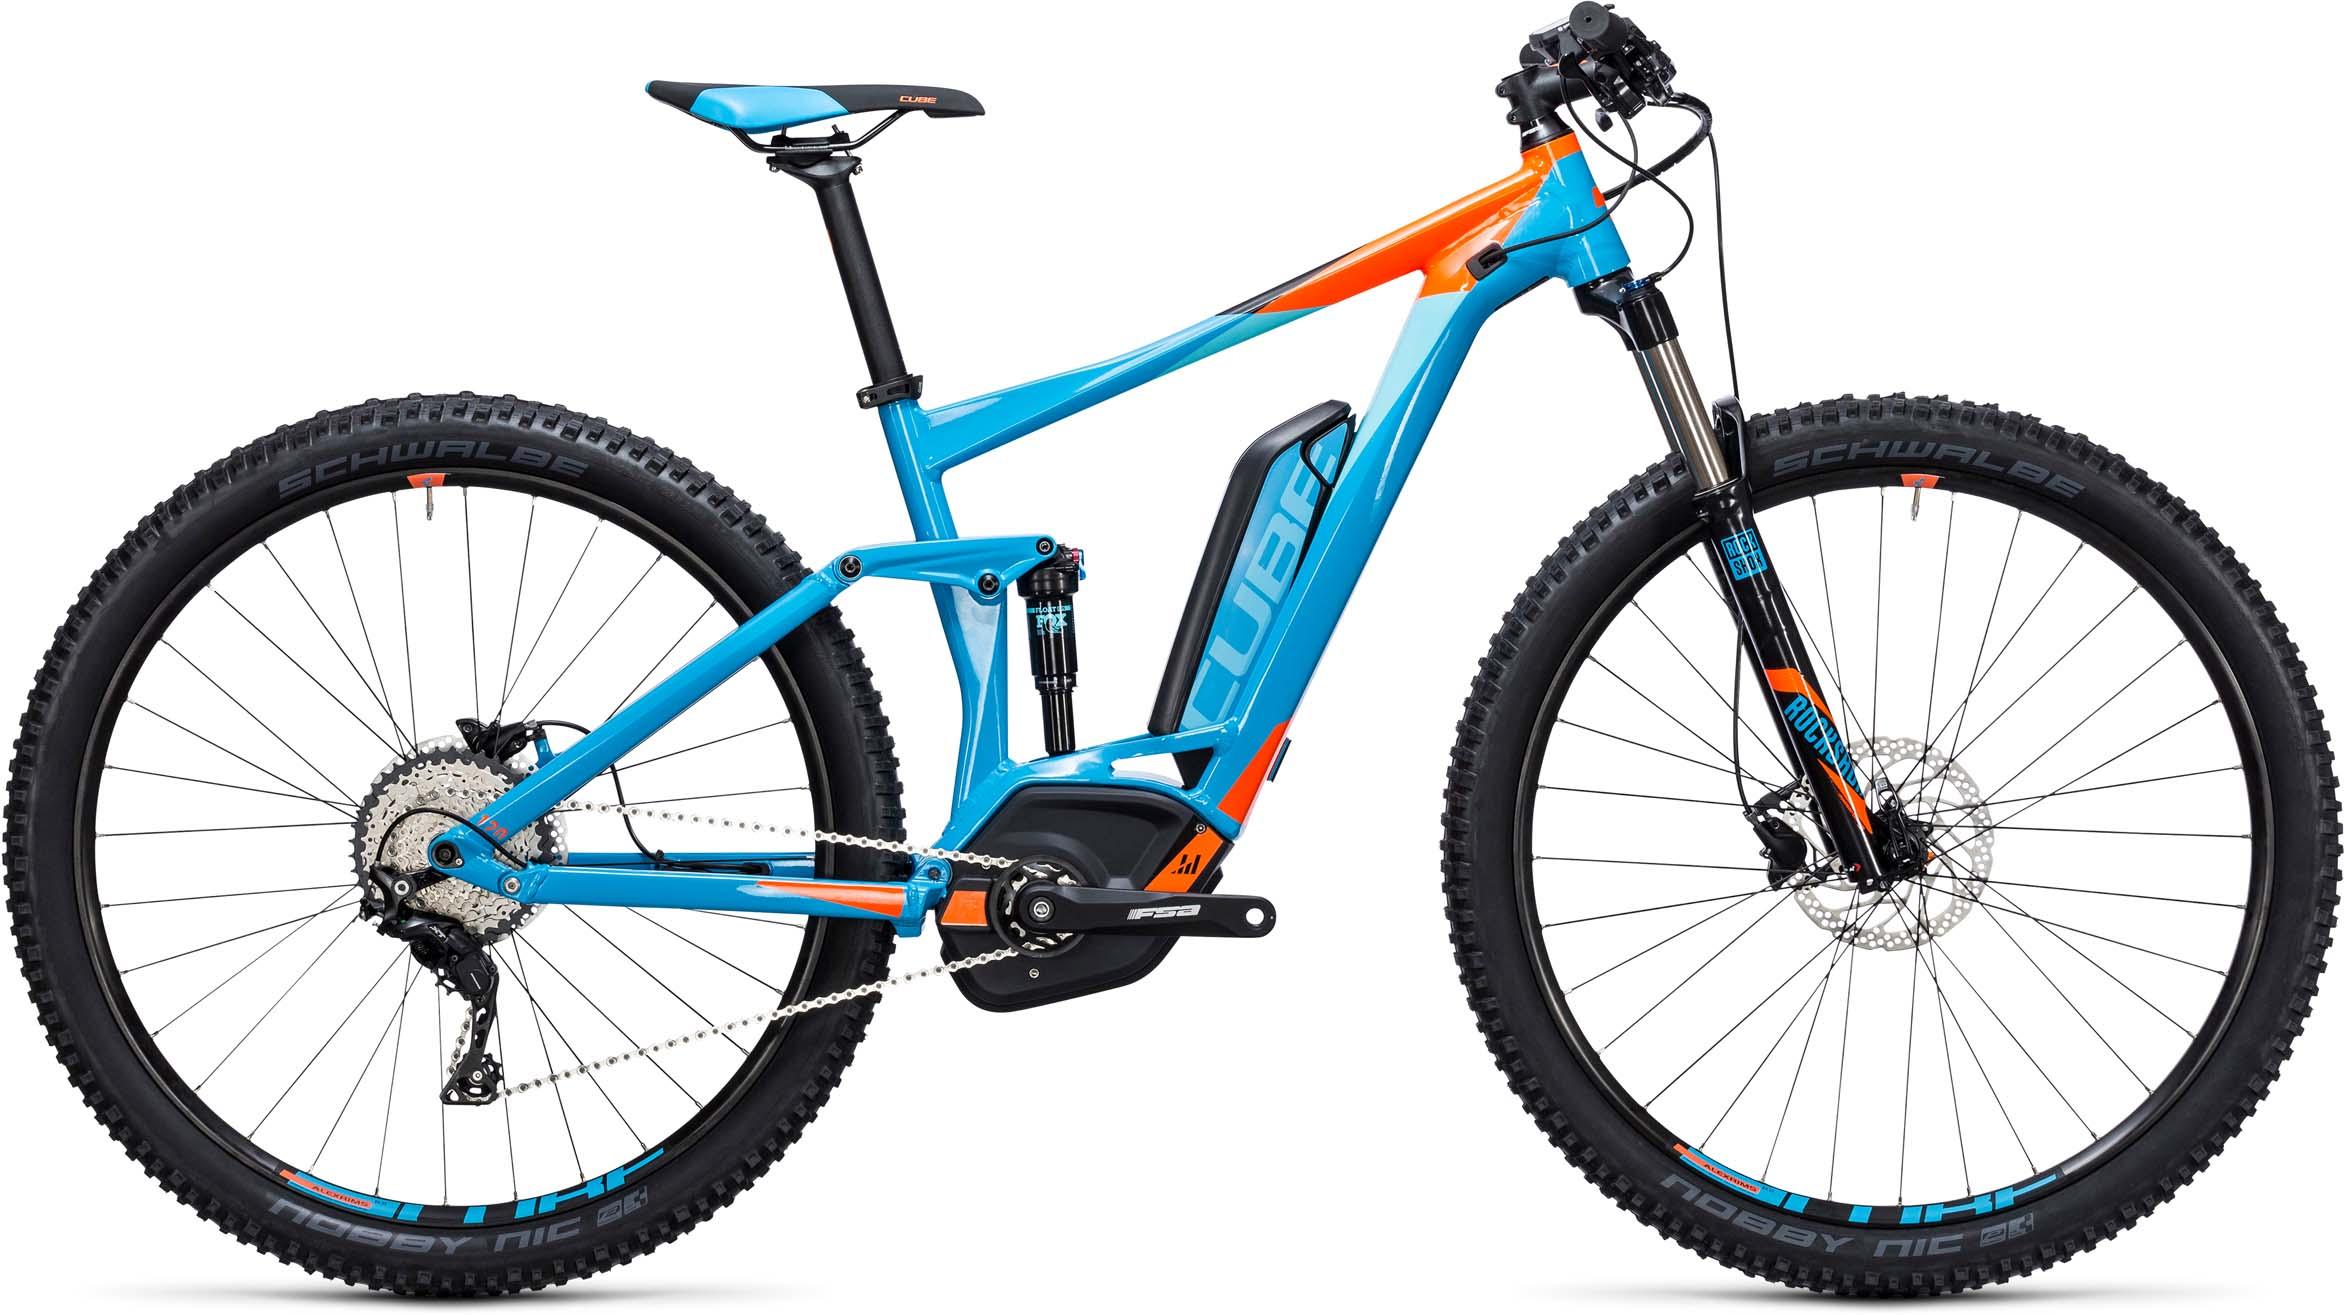 e bike mtb fully 29 zoll mountainbikes fully e bikes mhw r der f r alle der. Black Bedroom Furniture Sets. Home Design Ideas